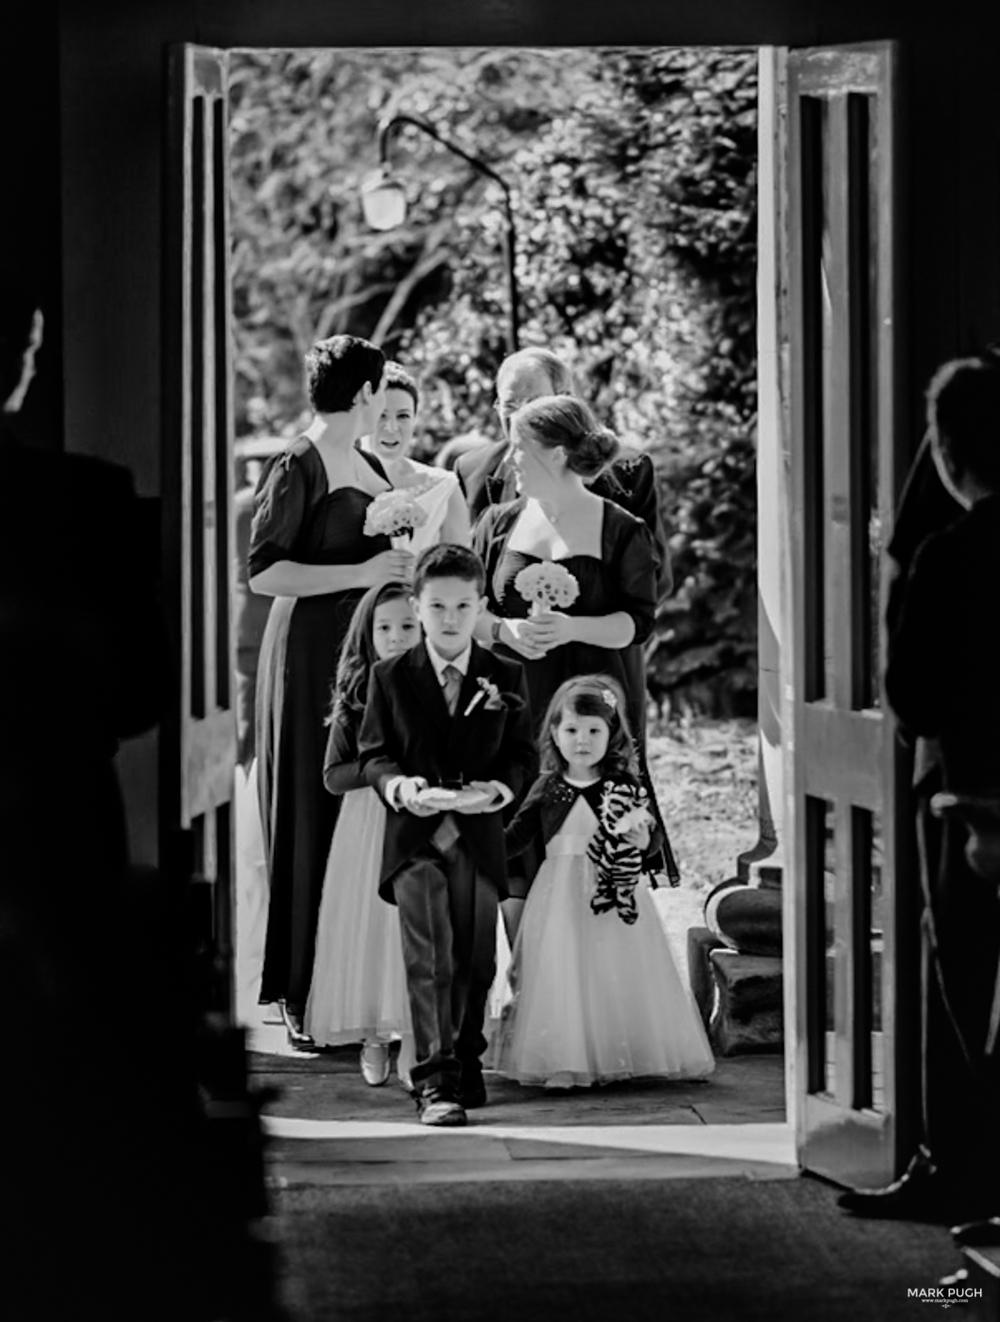 046  - Helen and Tim - Wedding Photography at Chatsworth House Bakewell Derbyshire DE45 1PP - Wedding Photographer Mark Pugh www.markpugh.com -117.JPG